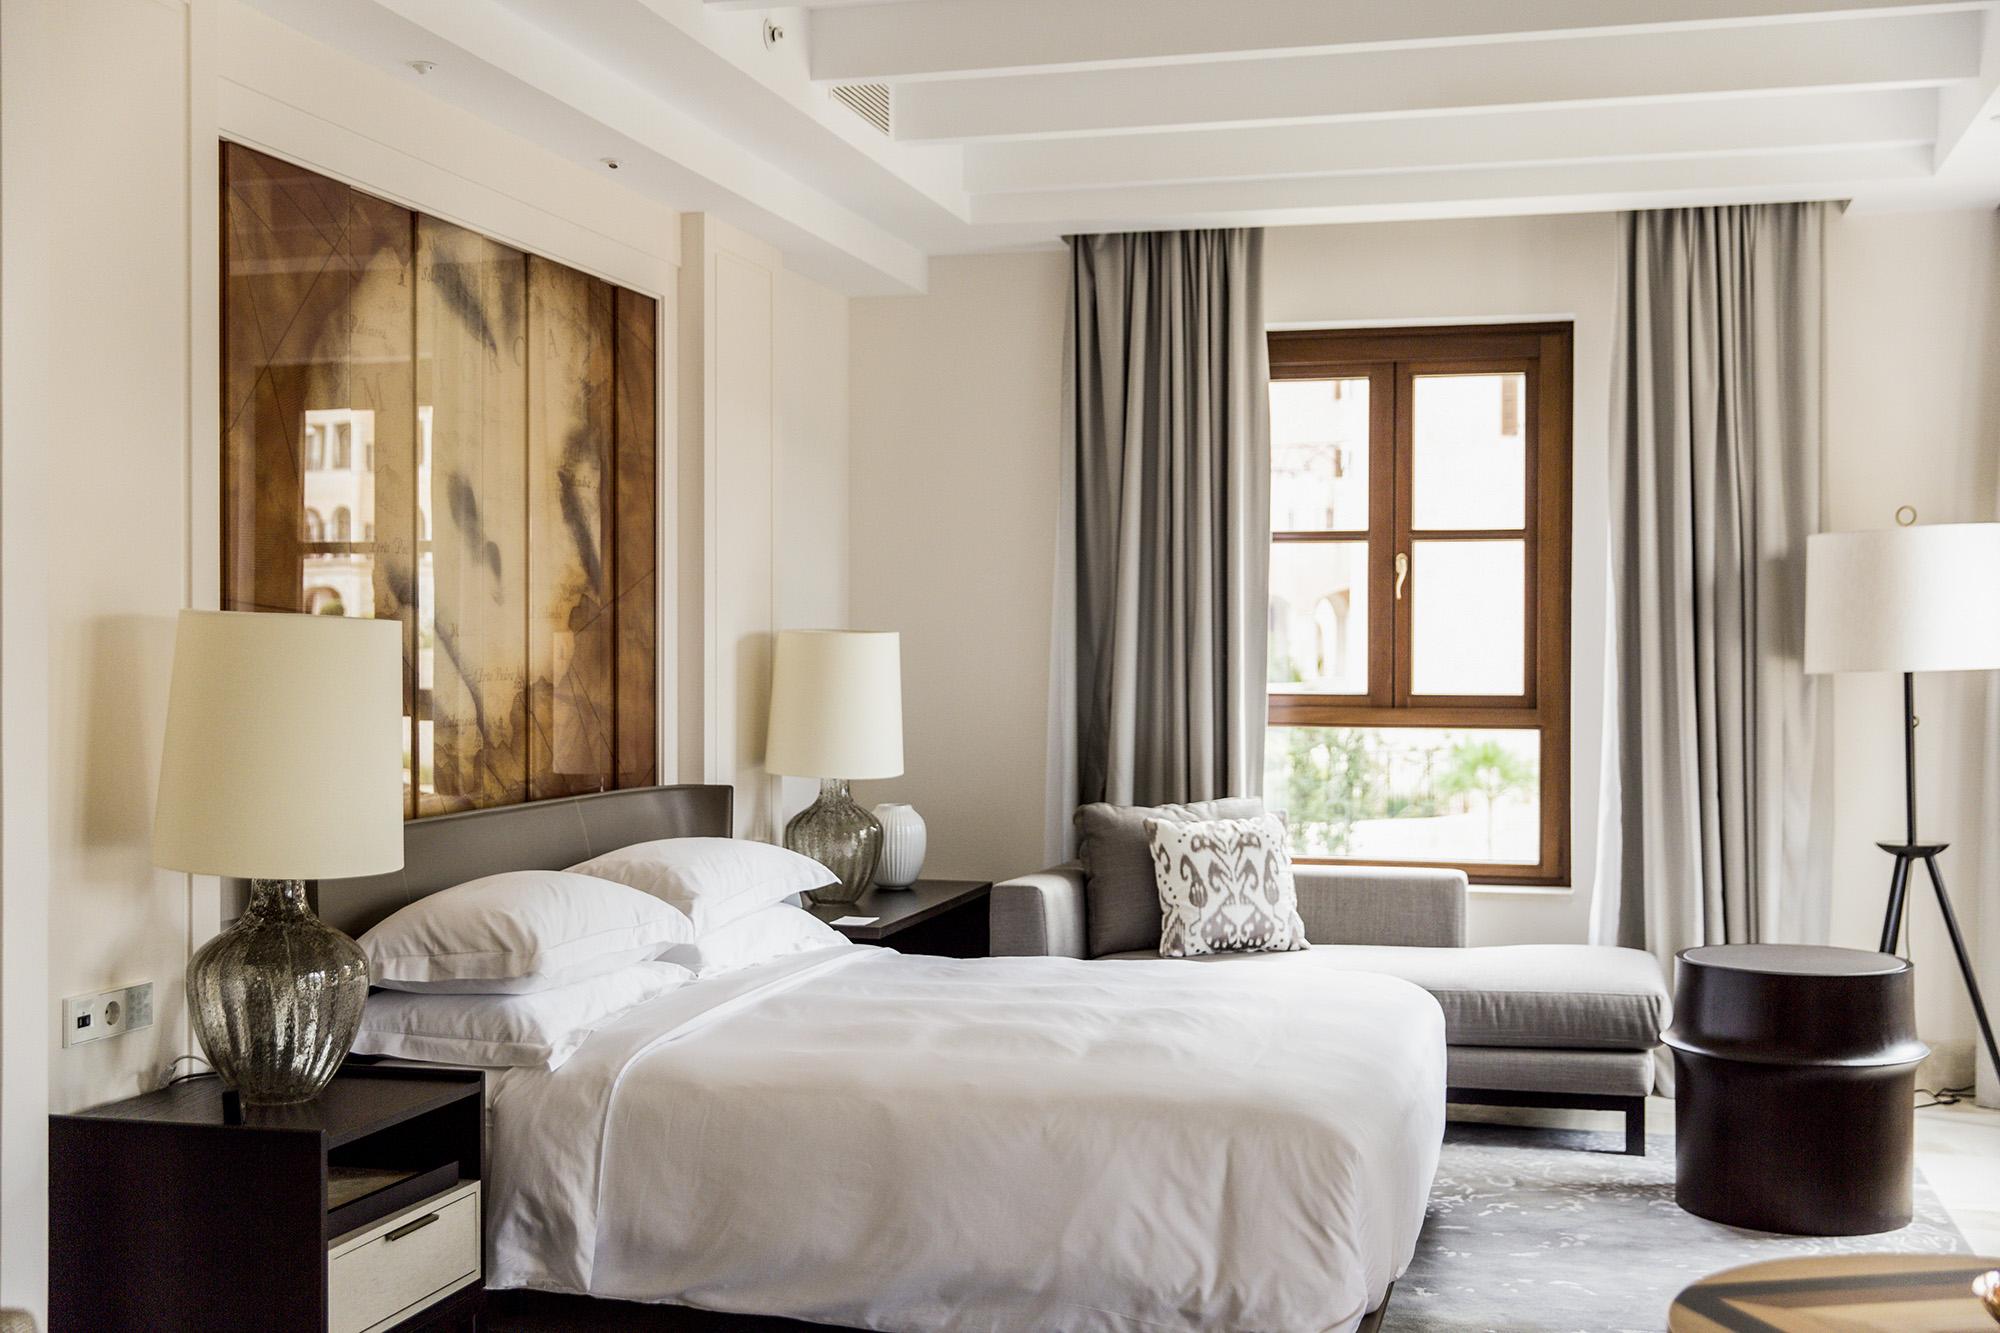 The Presidential Suite bedroom